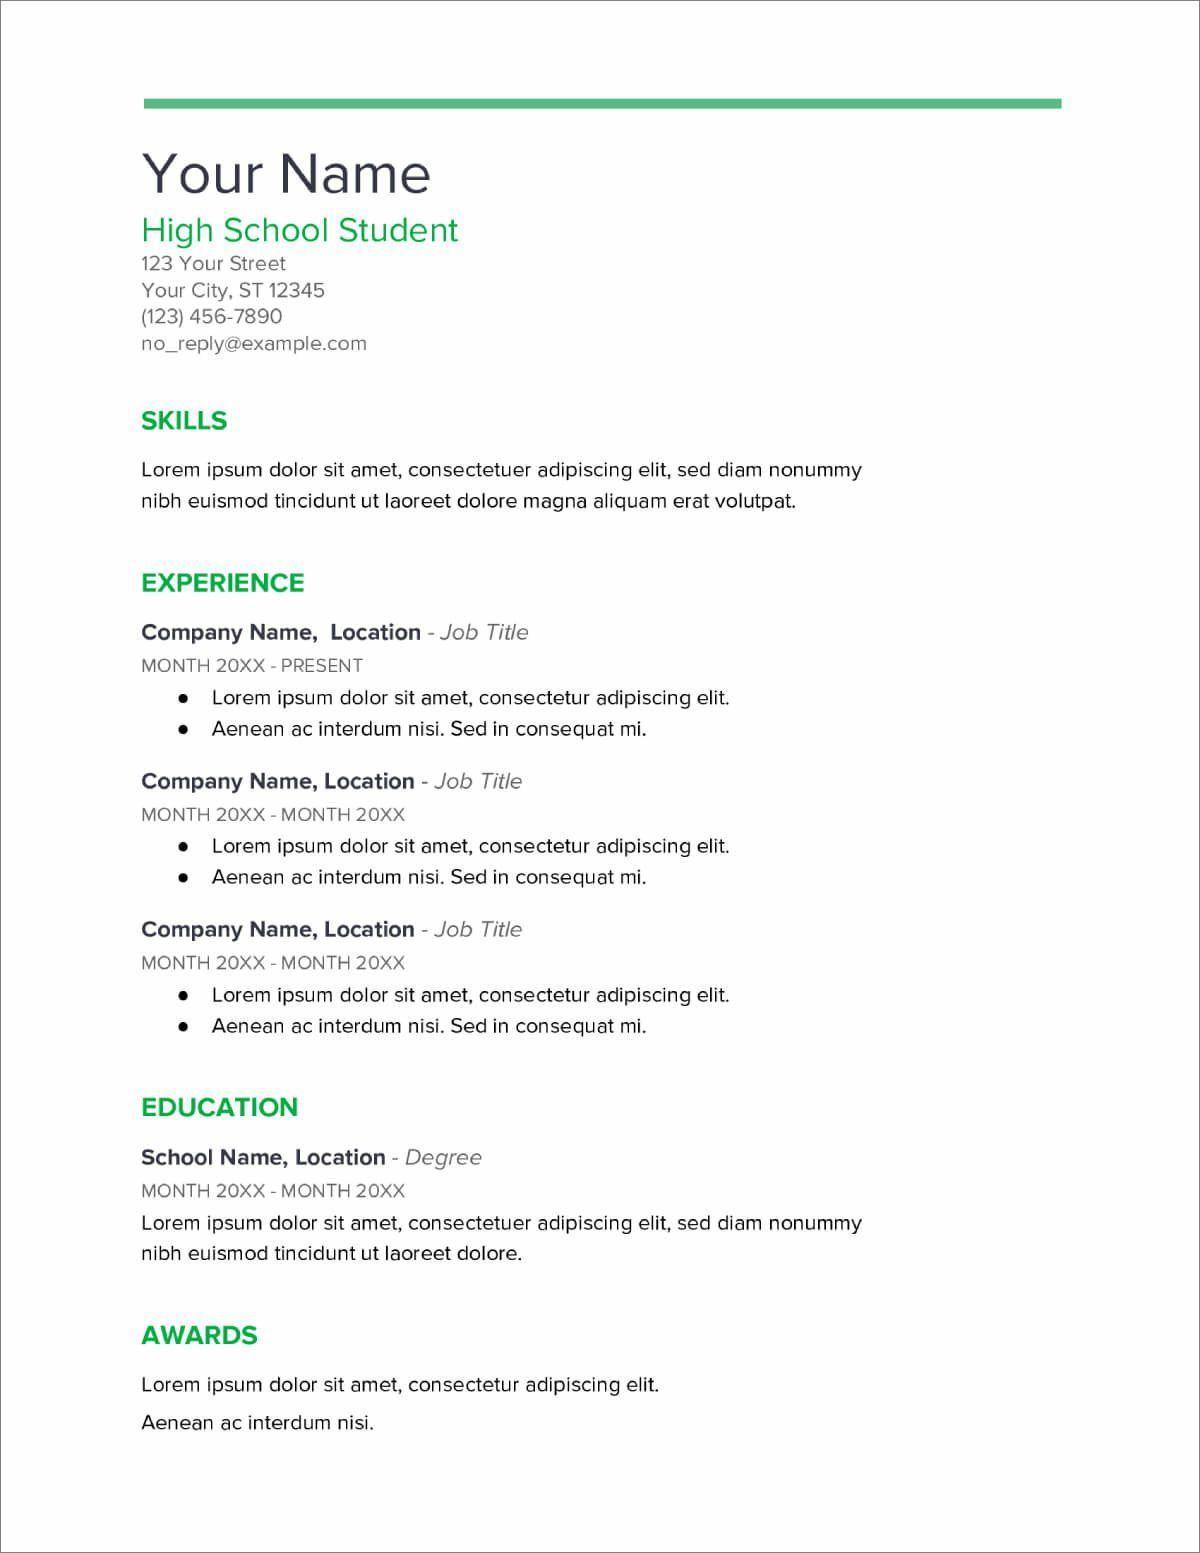 005 Stupendou Resume Template High School Picture  Student Australia For Google Doc Graduate Microsoft WordFull